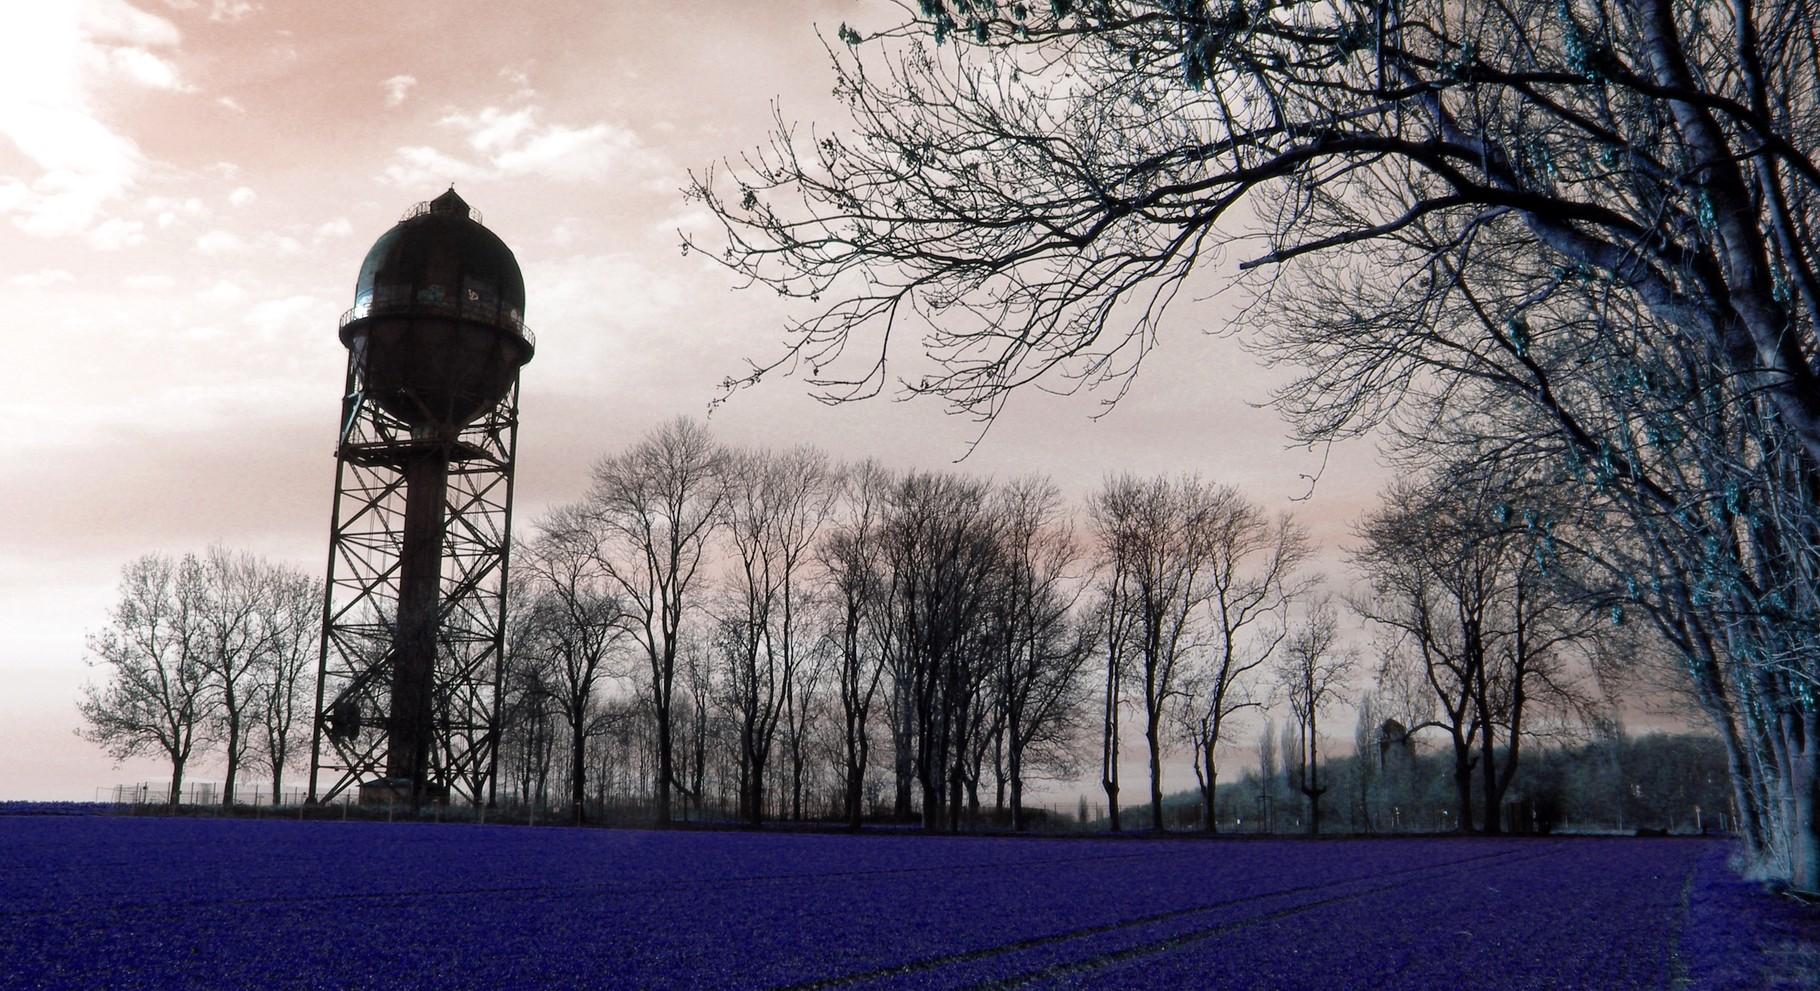 Wasserturm Dortmund, 2014